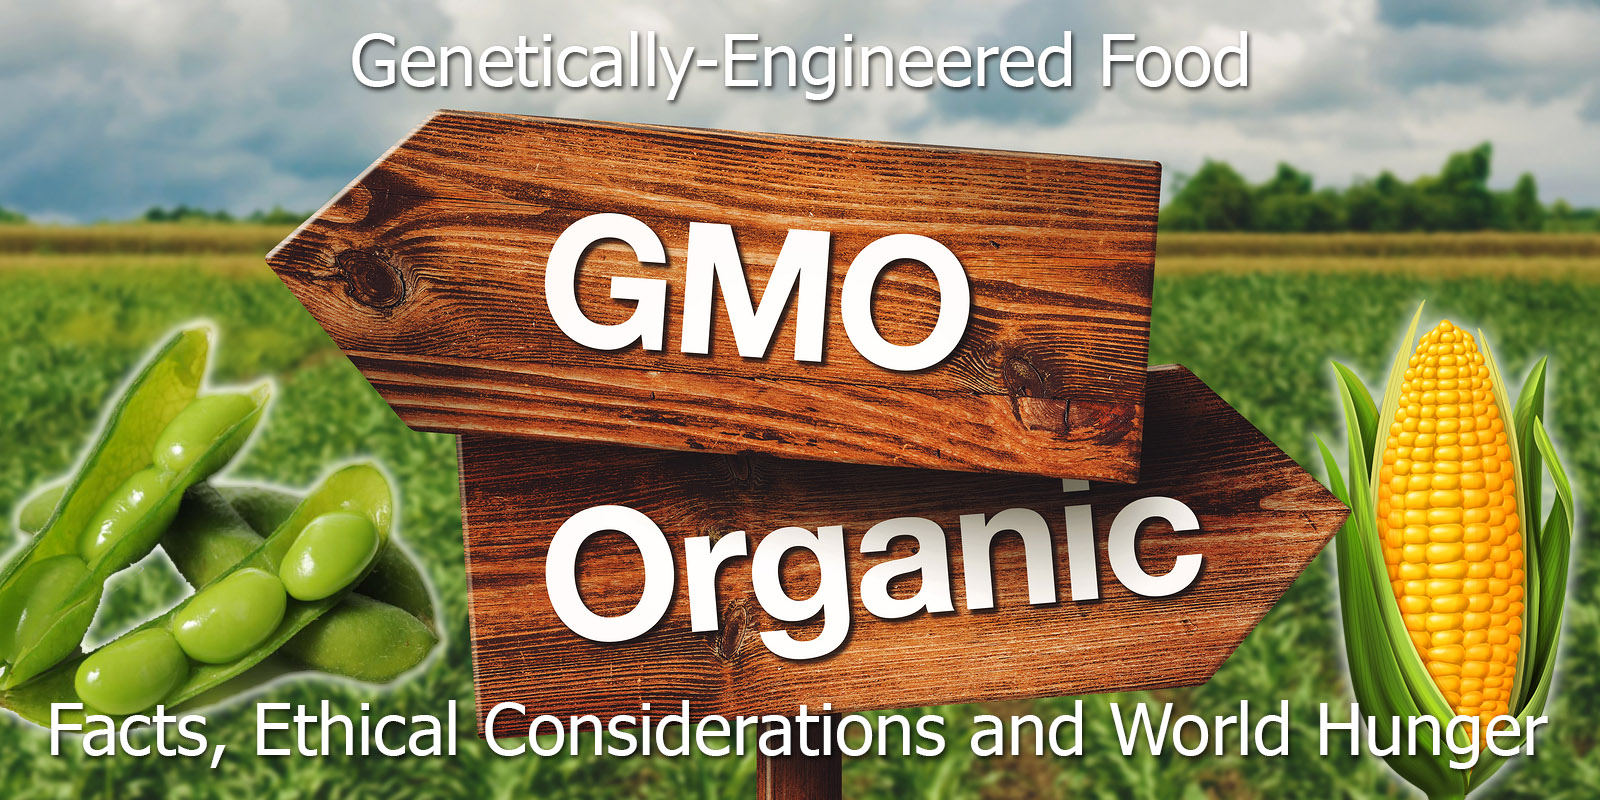 Geneticall-Engineered Food